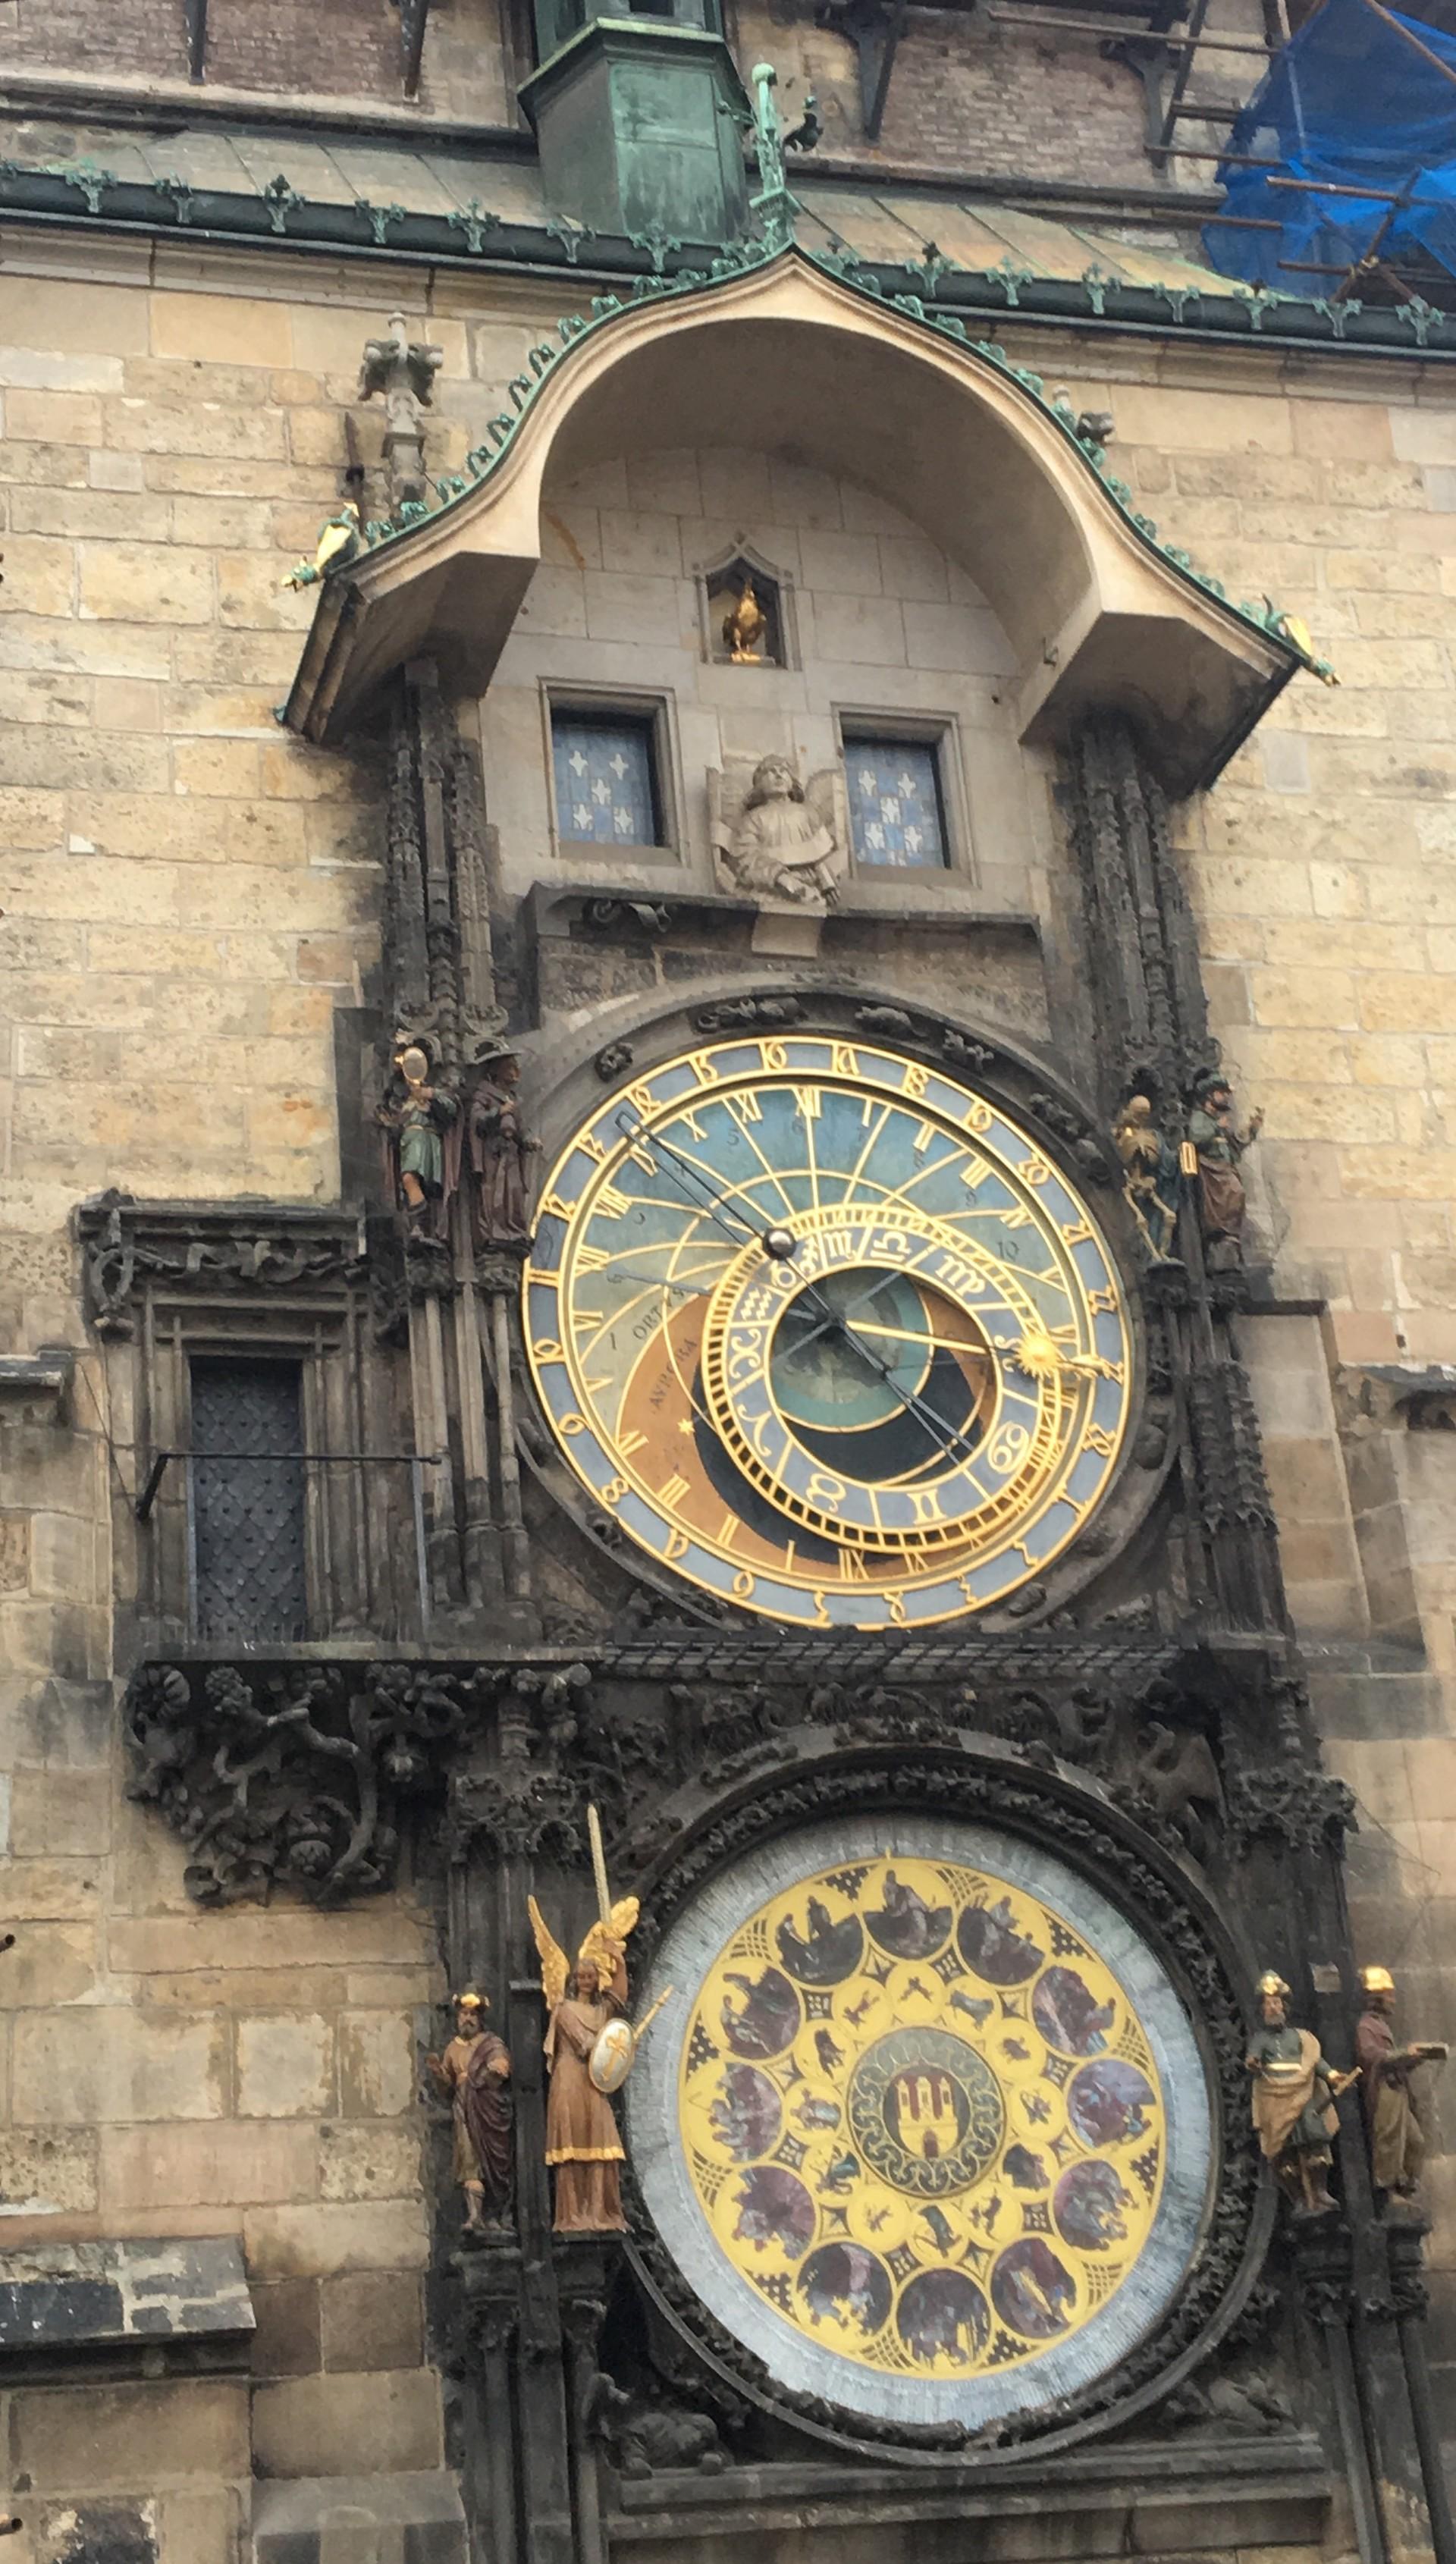 mucho-mas-reloj-fef89a98f6ea03378d89568b